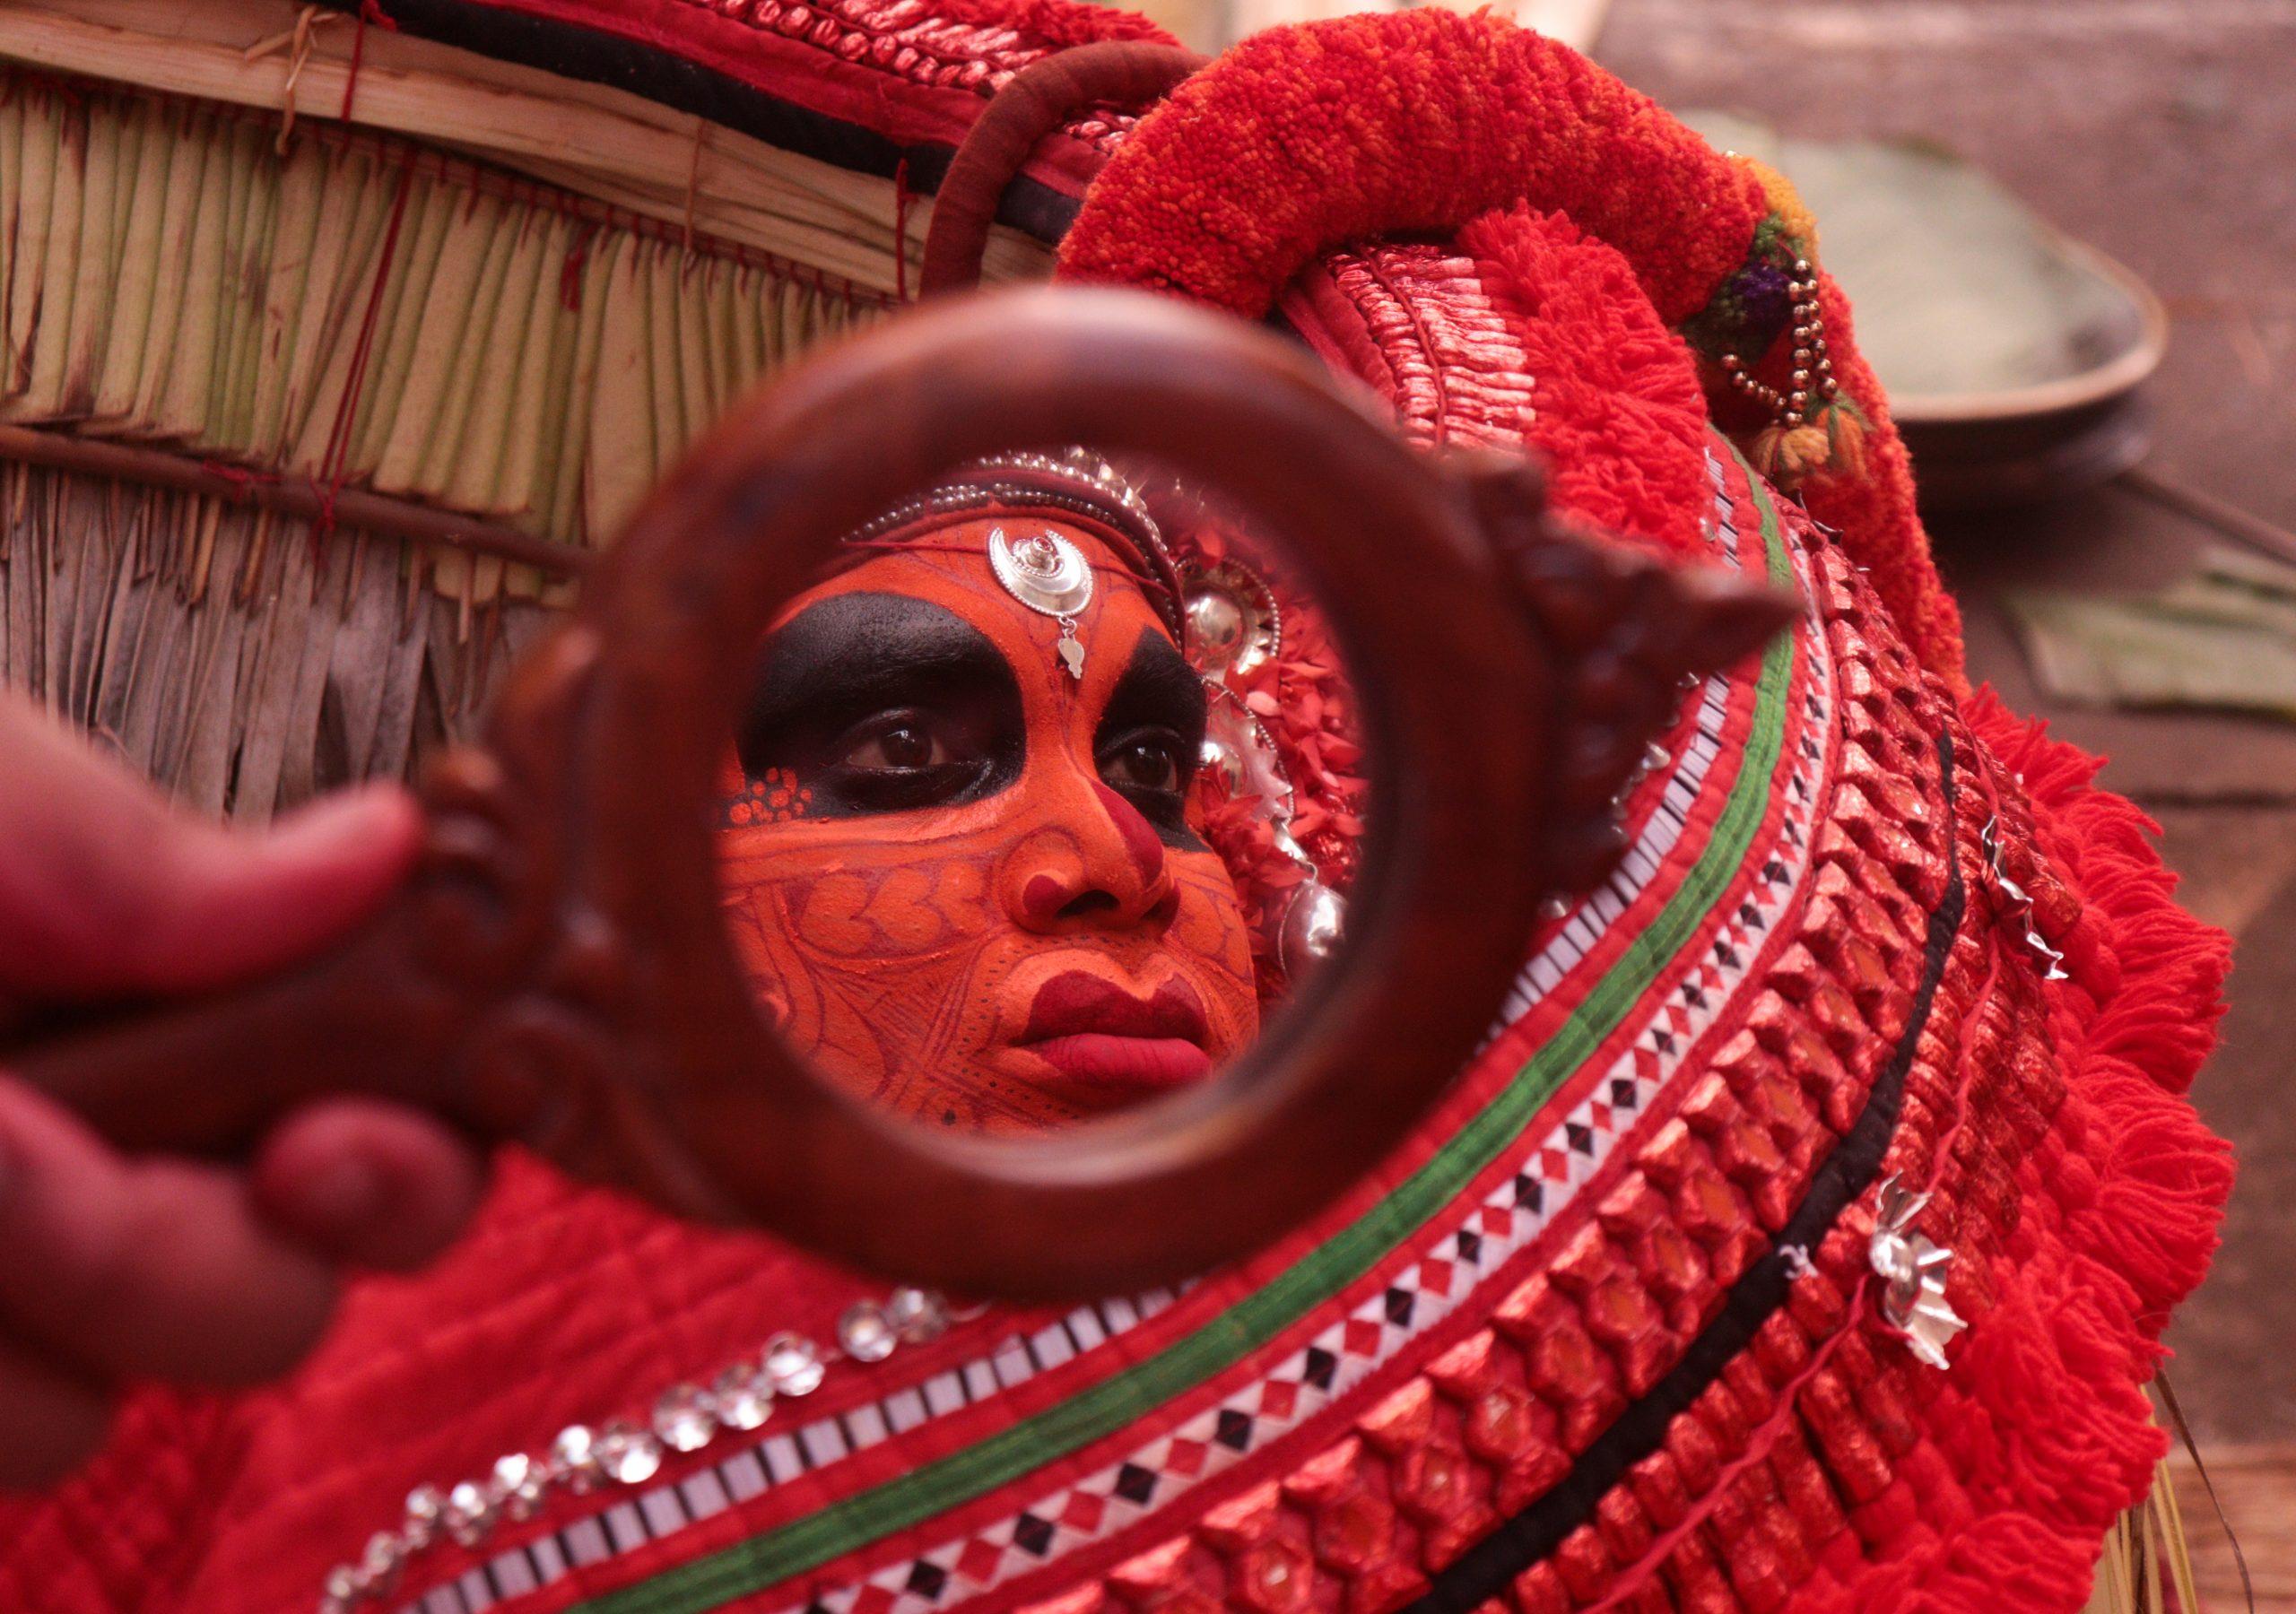 Vishnumoorthy Theyyam face makeup reflected in mirror